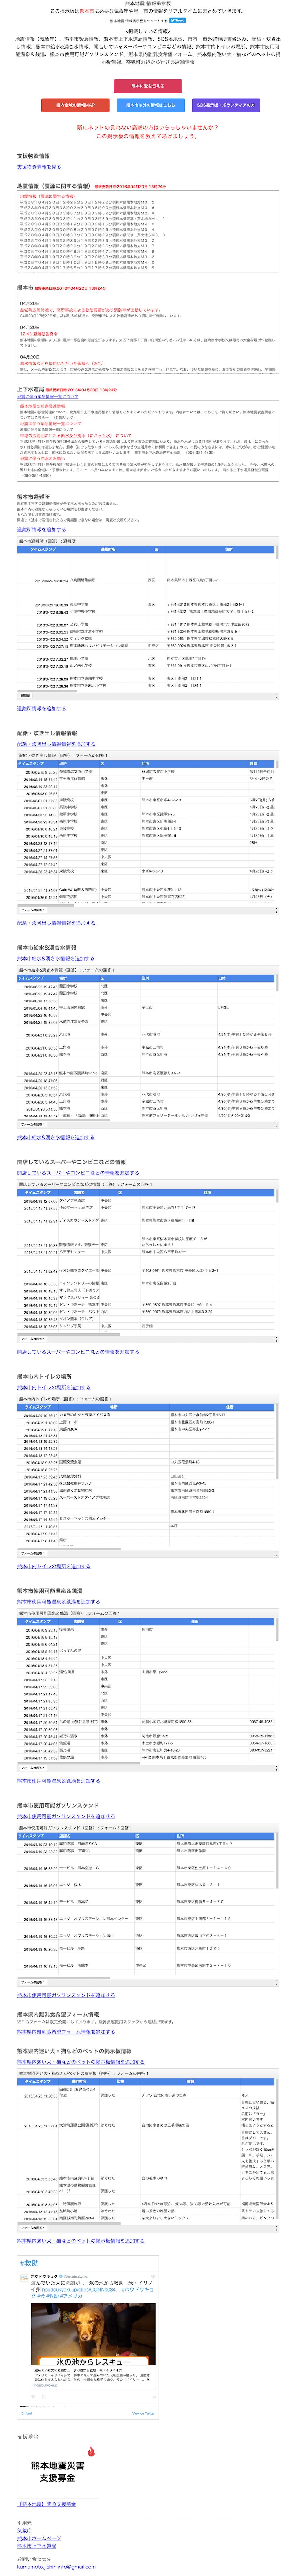 screencapture-localhost-3000-1481724999292.png